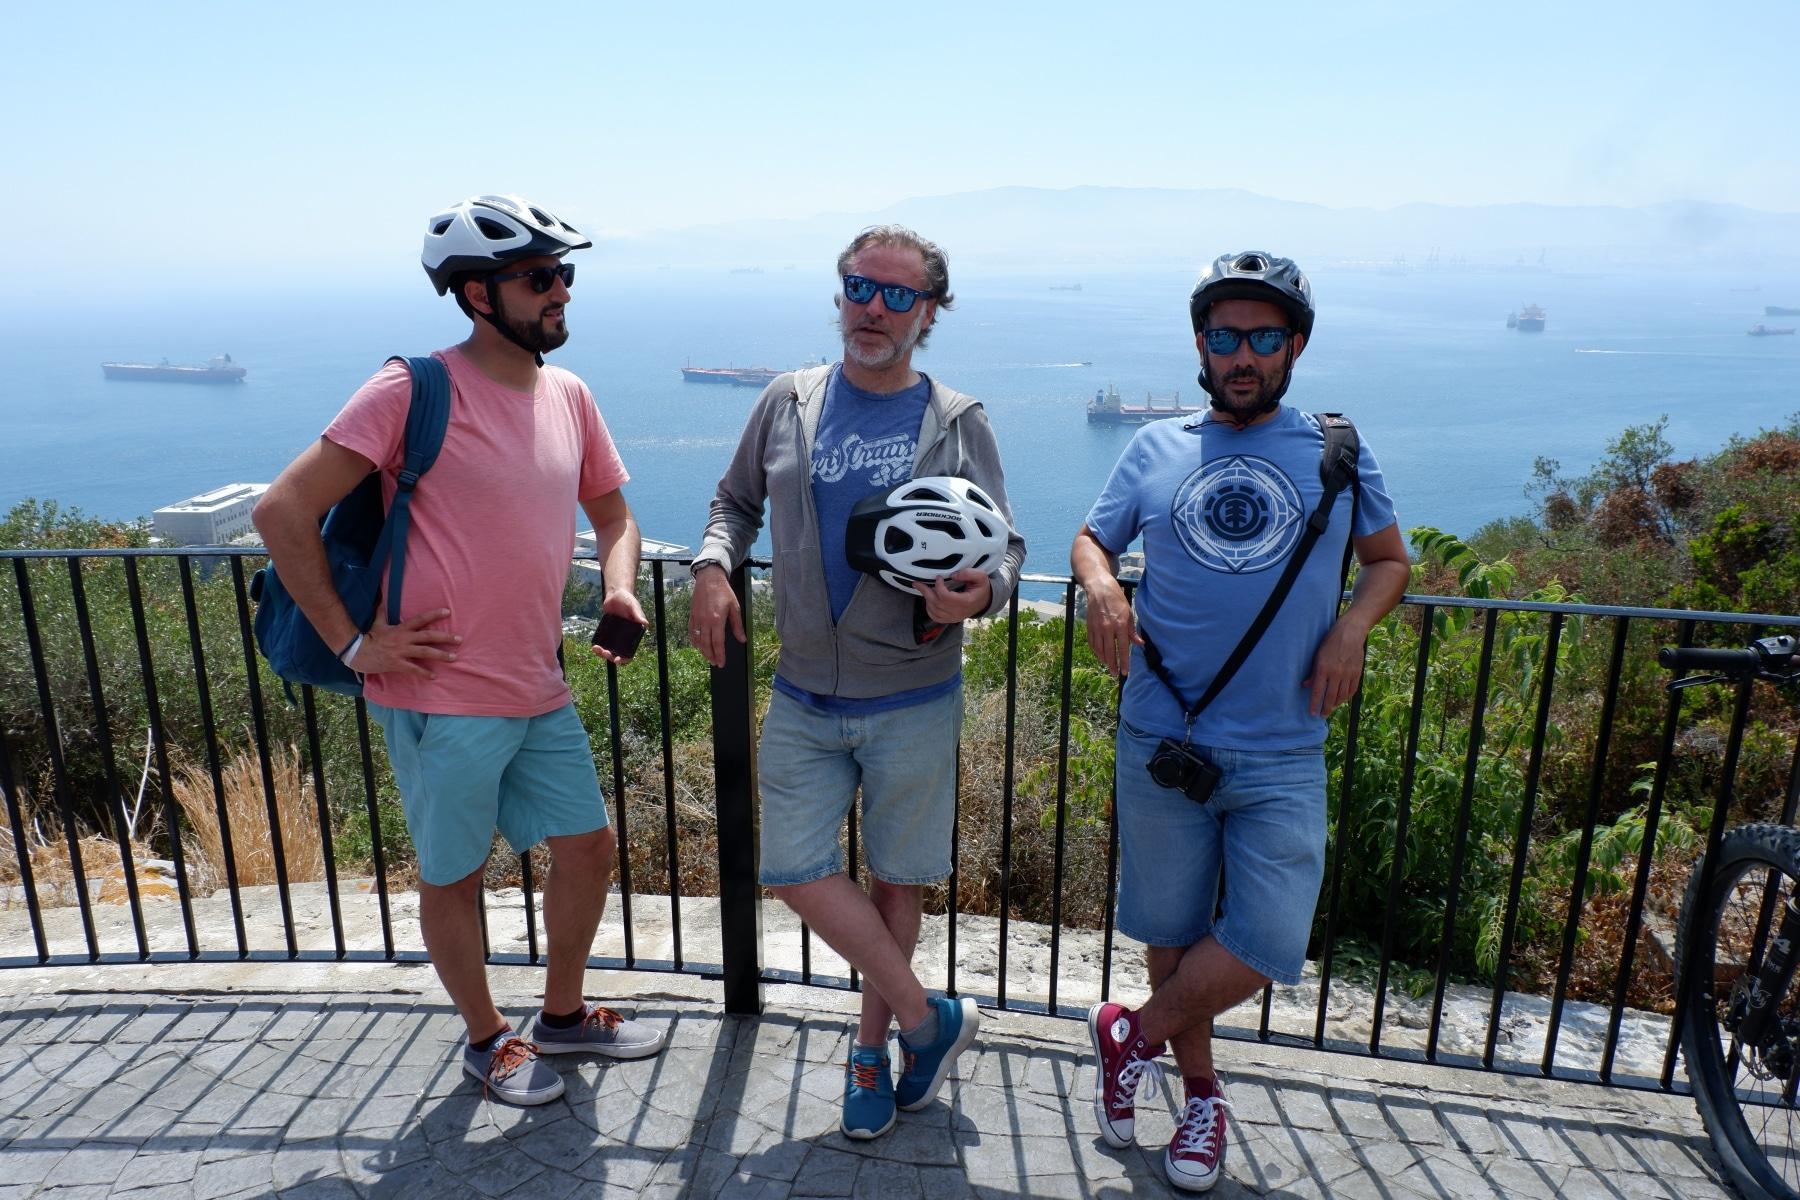 23-jun-2019-blogueros-espaoles-de-viajes-visitan-el-pen_48131155967_o